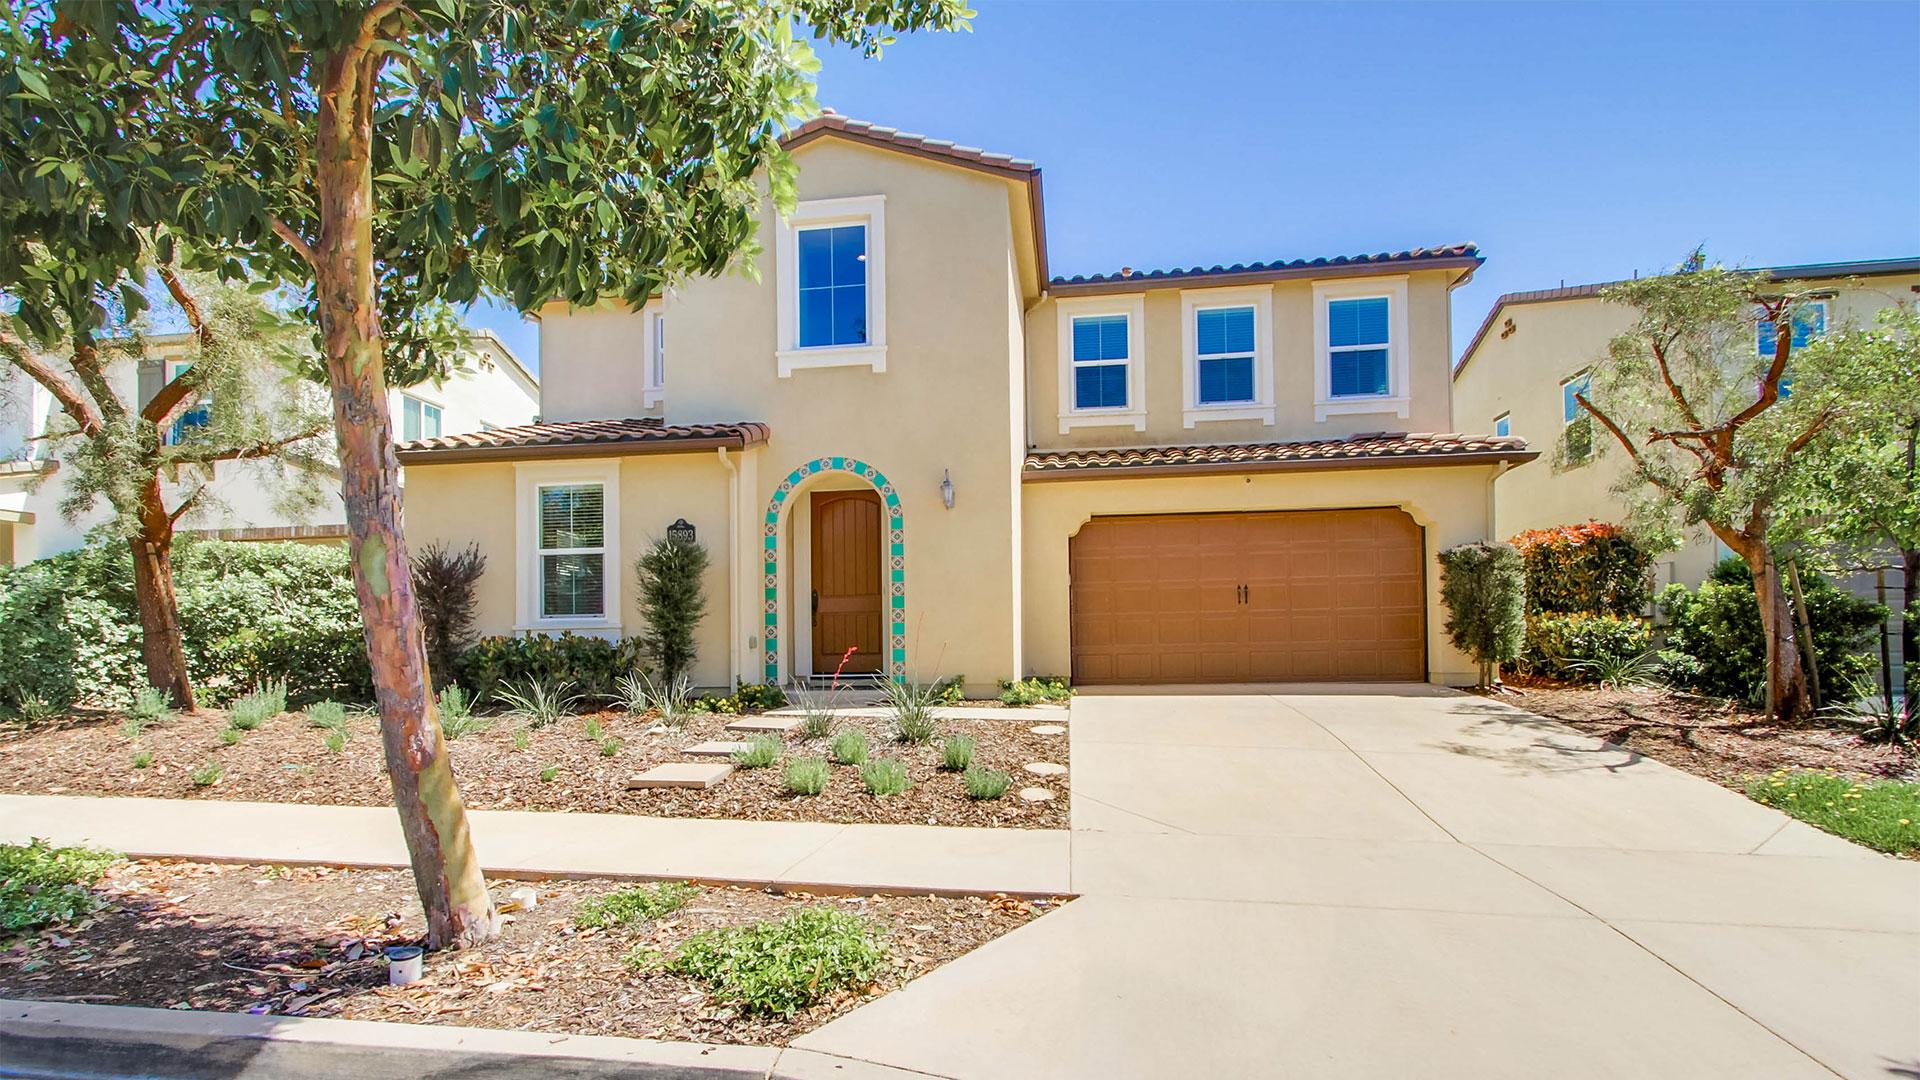 15893 Monte Alto Terrace San Diego, CA 92127